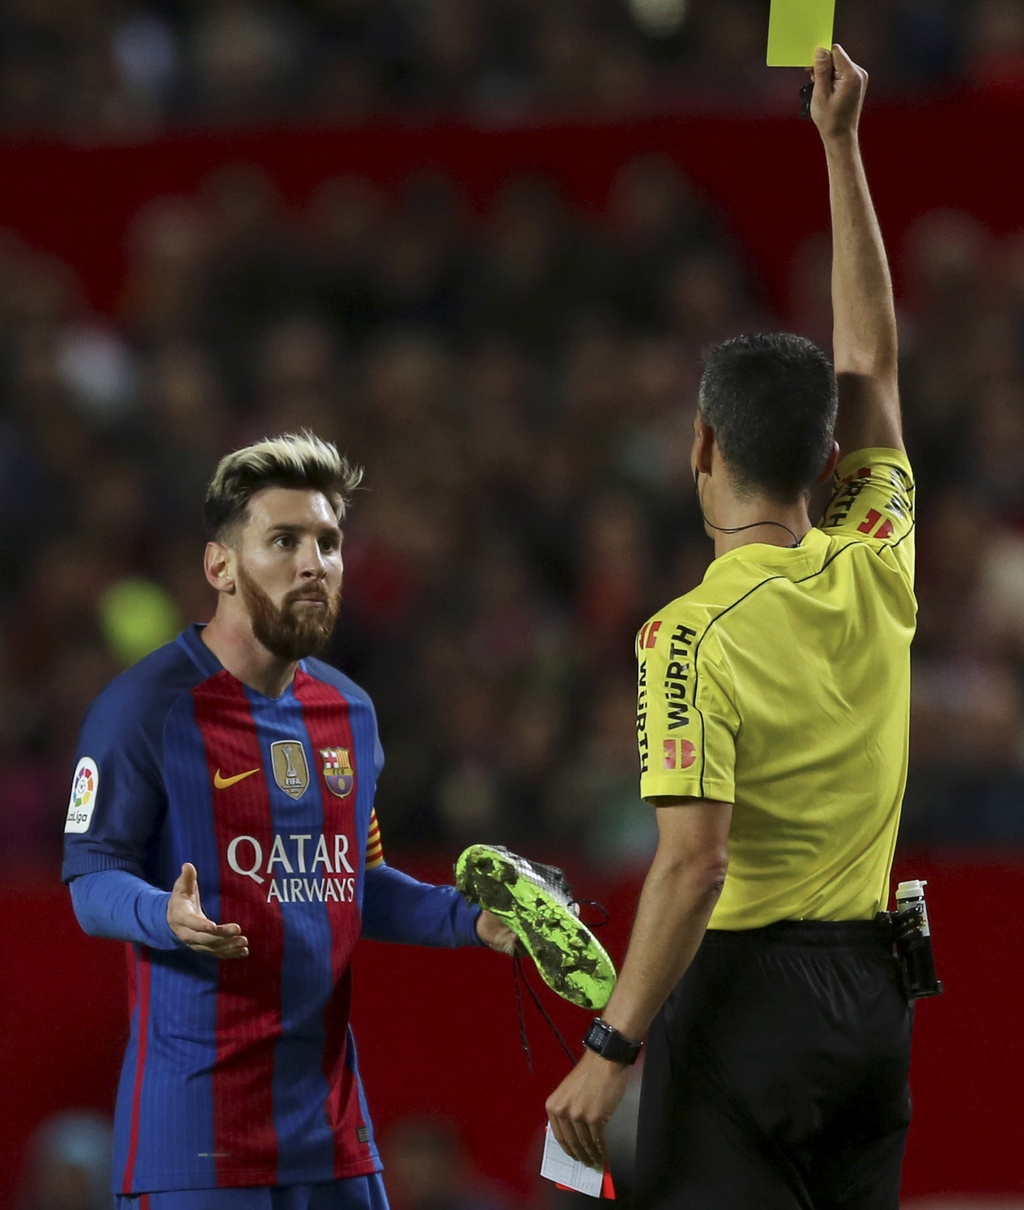 Messi noi gian nem giay vi the phat khong dang co hinh anh 4